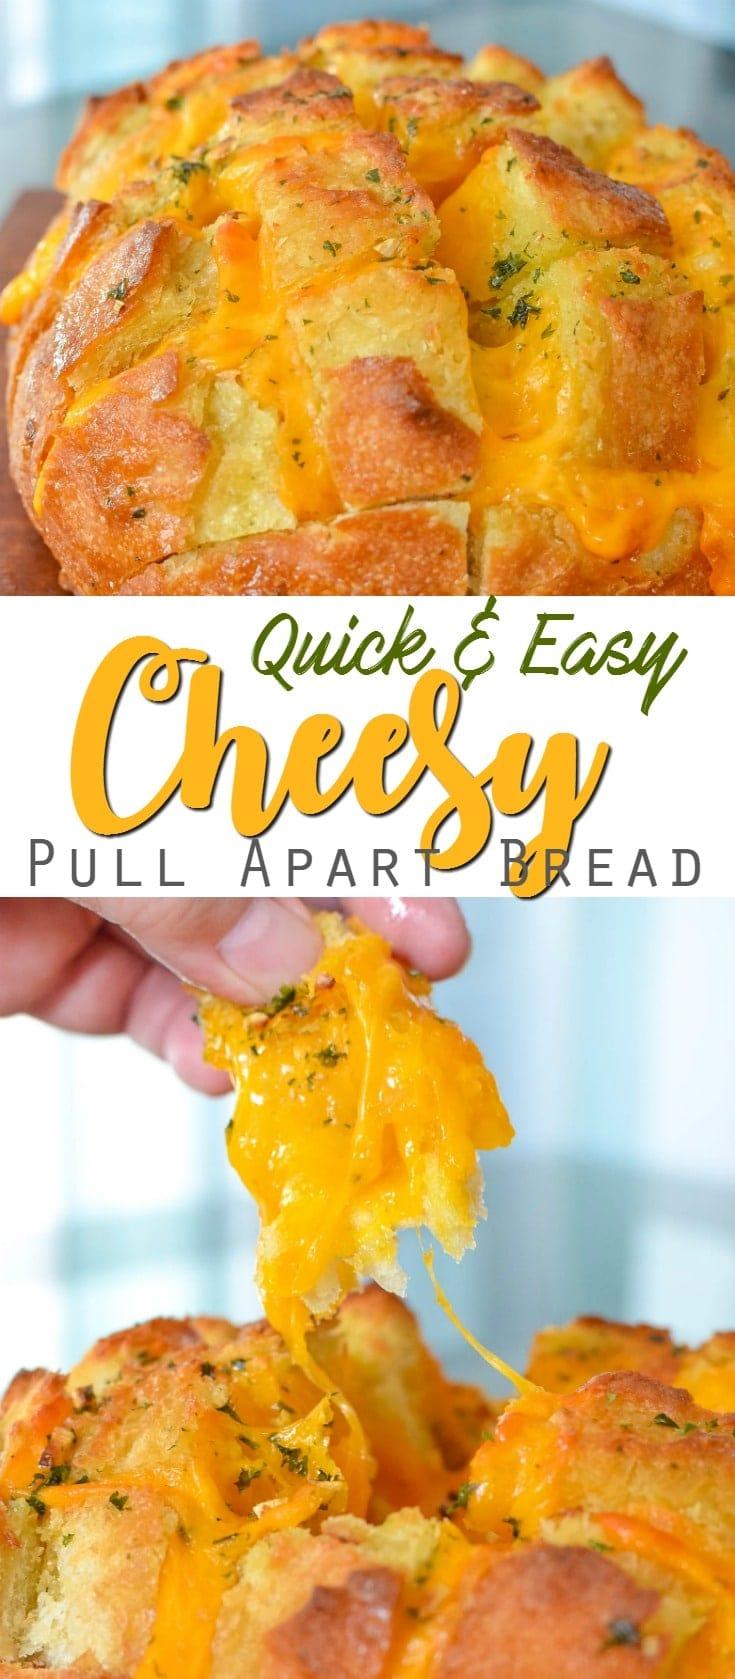 quick and easy cheesy pull apart bread recipe